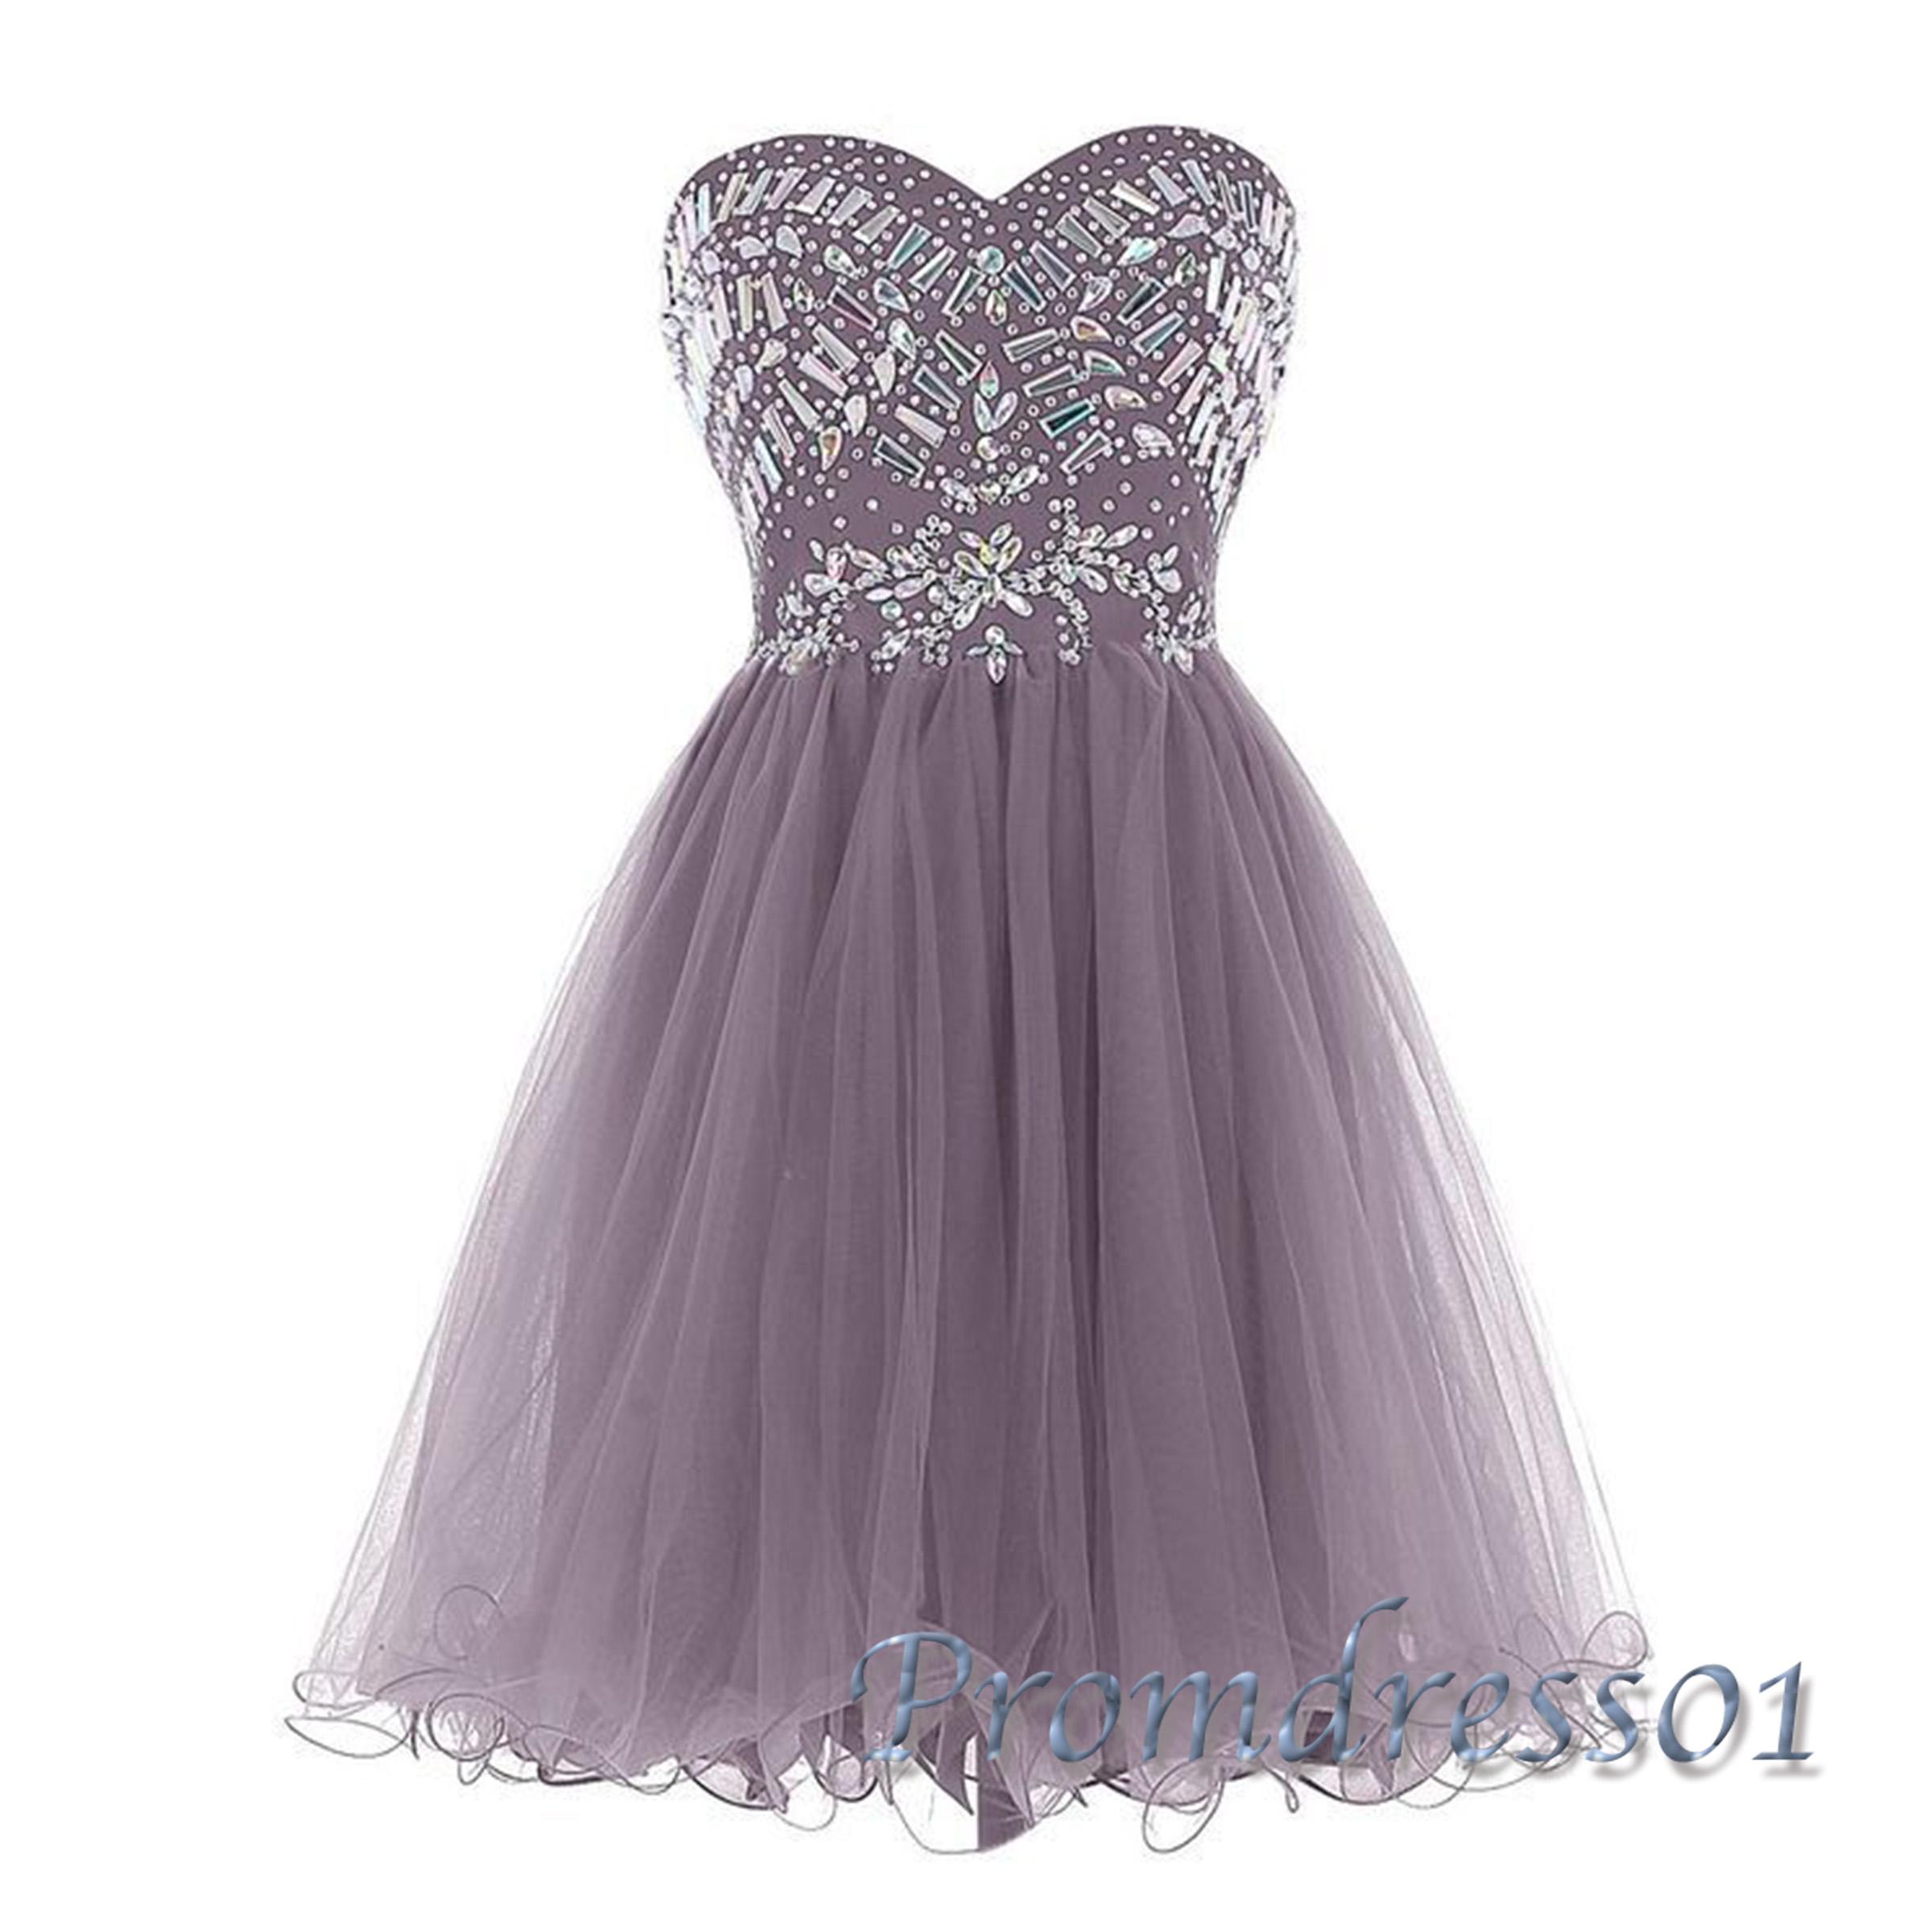 Cute beaded purple organza short home ing dress